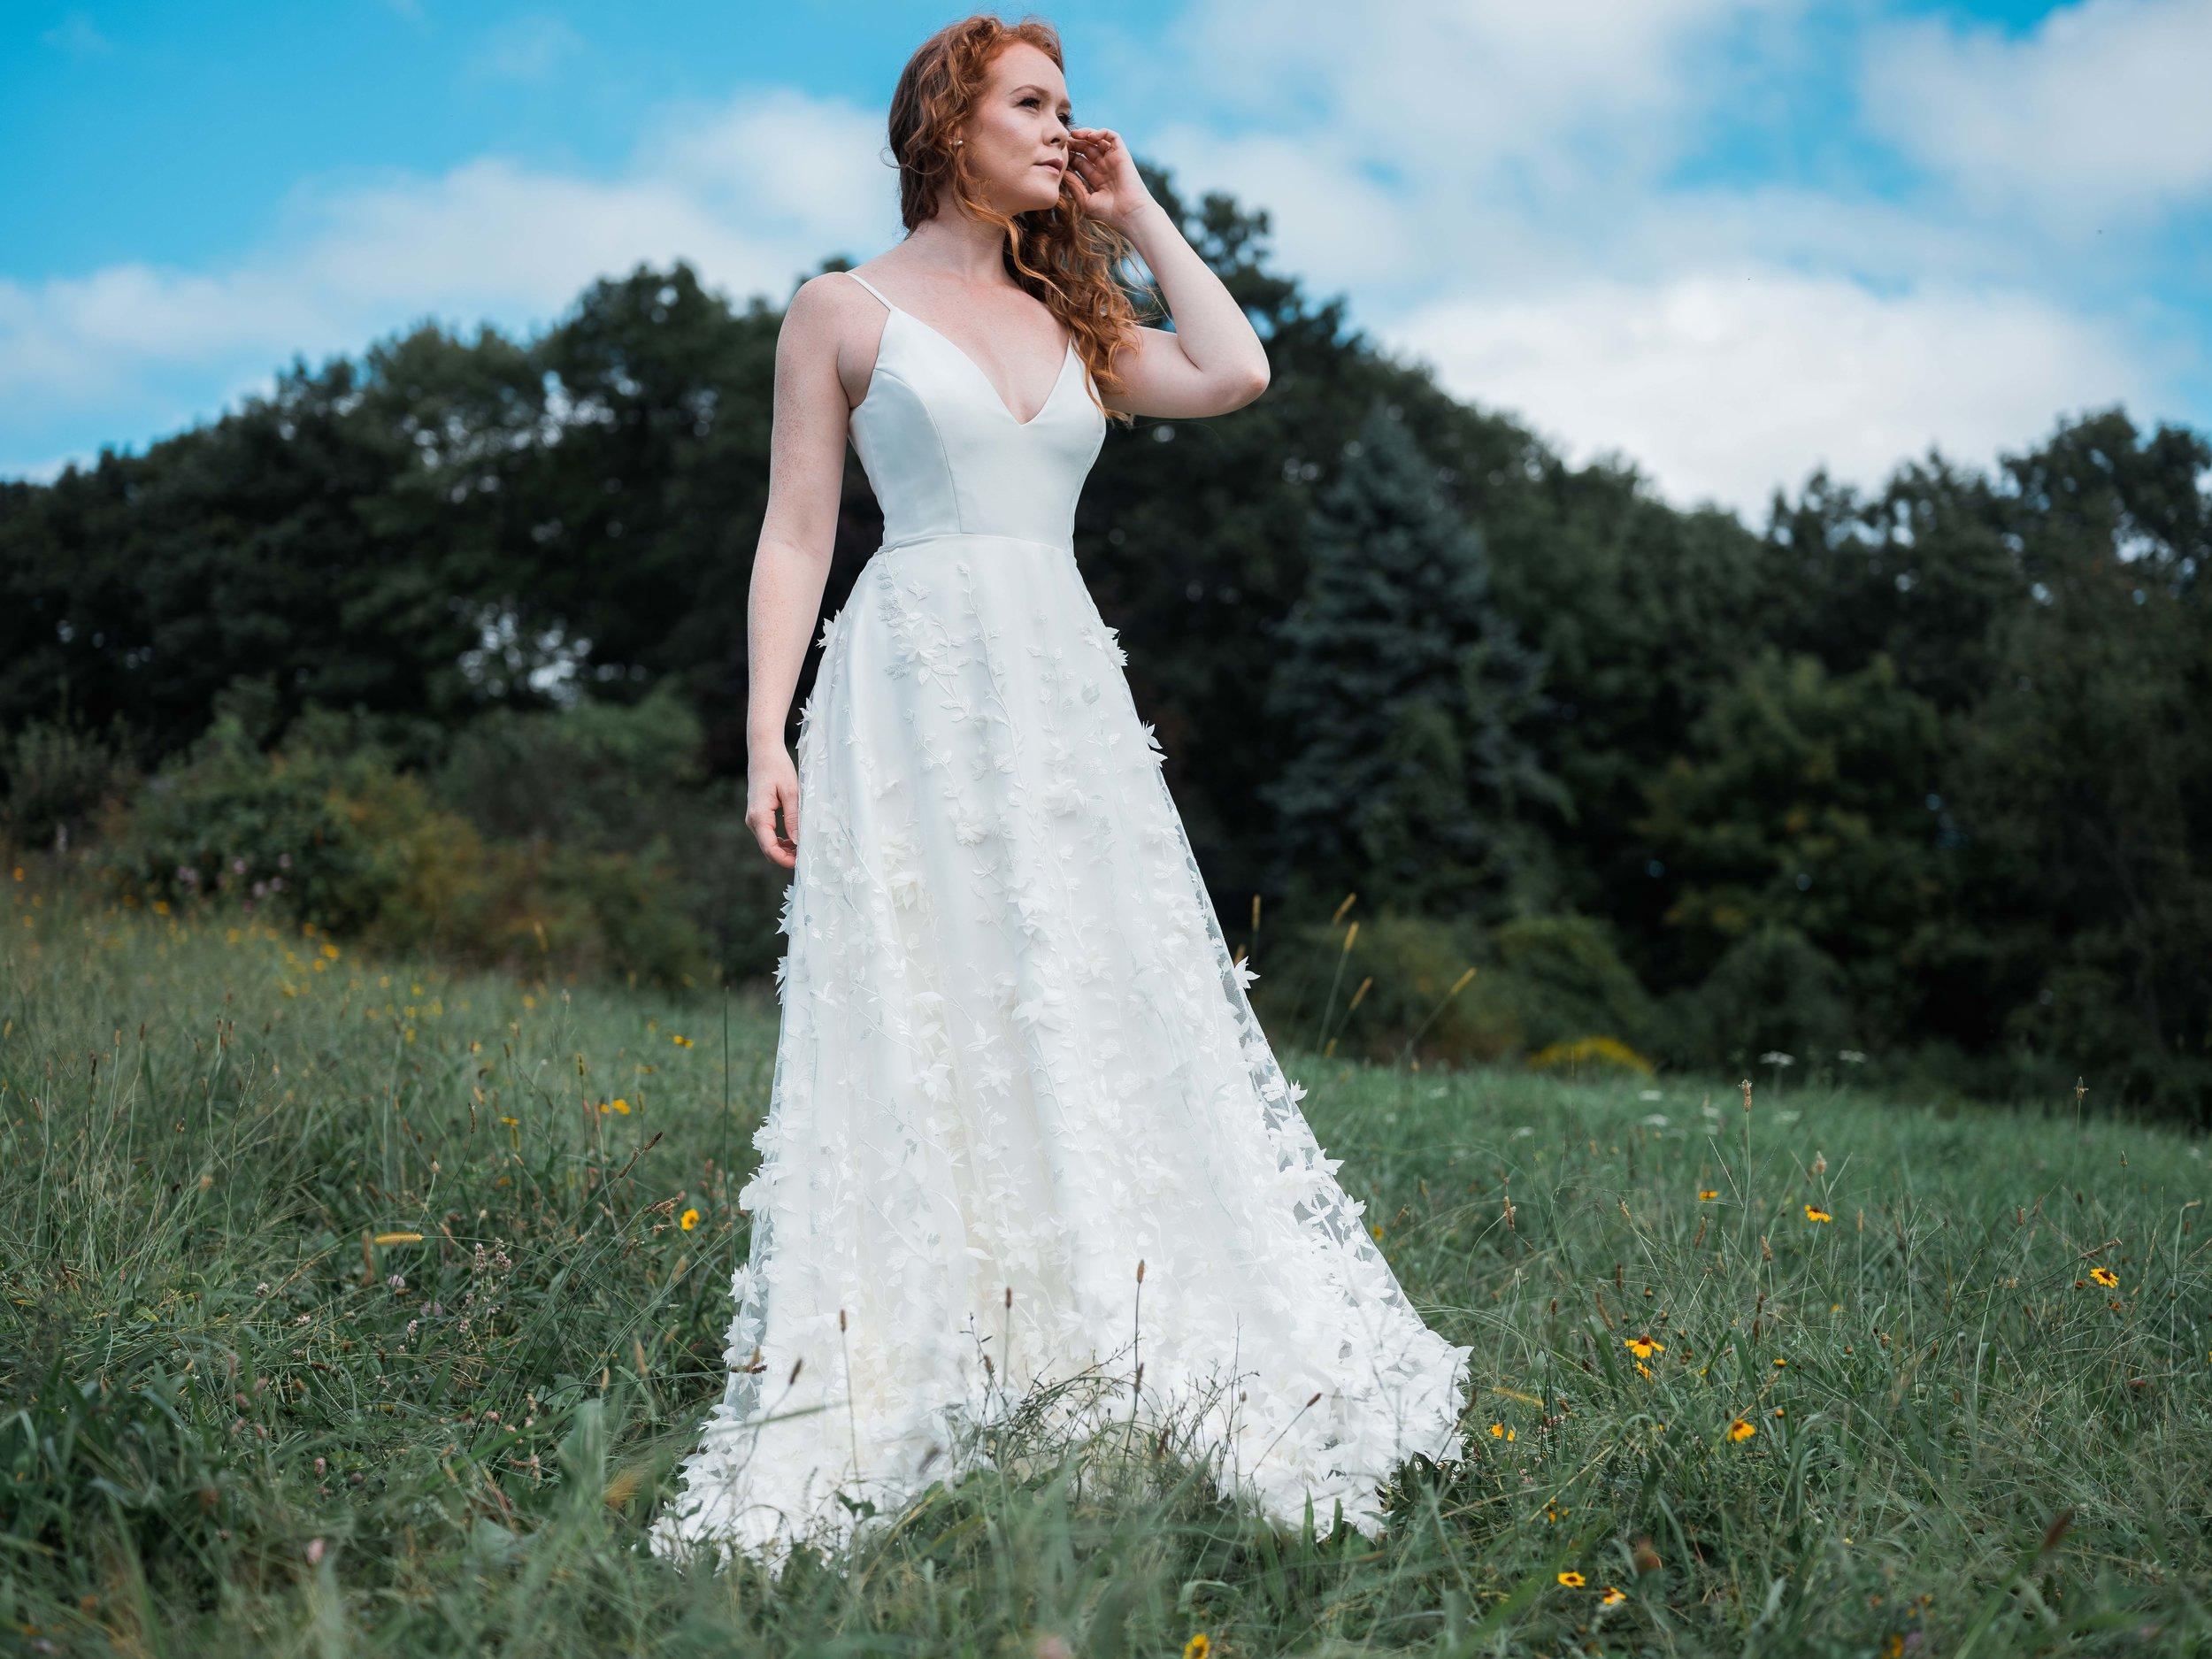 WSPCo-Gather-Greene-Rebecca-Schoneveld-Bridal-24.jpg